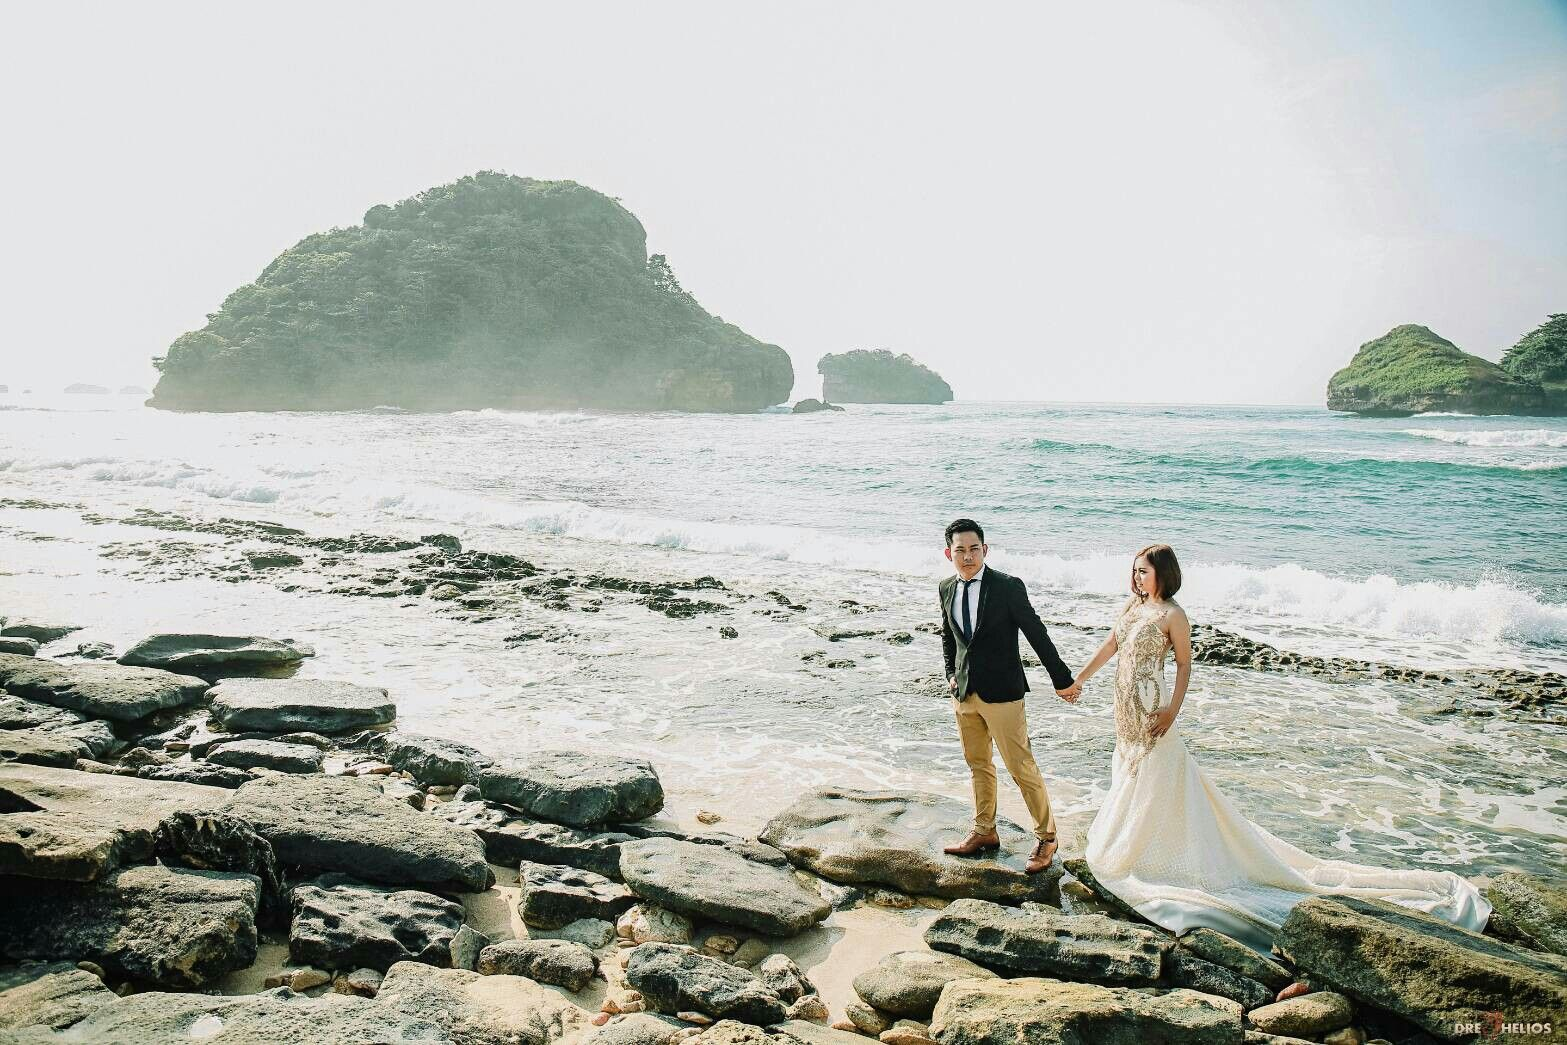 Pre wedding beach  HELIOS by Dre  Andre Agassi  Malang Prewedding HELIOS  Pinterest